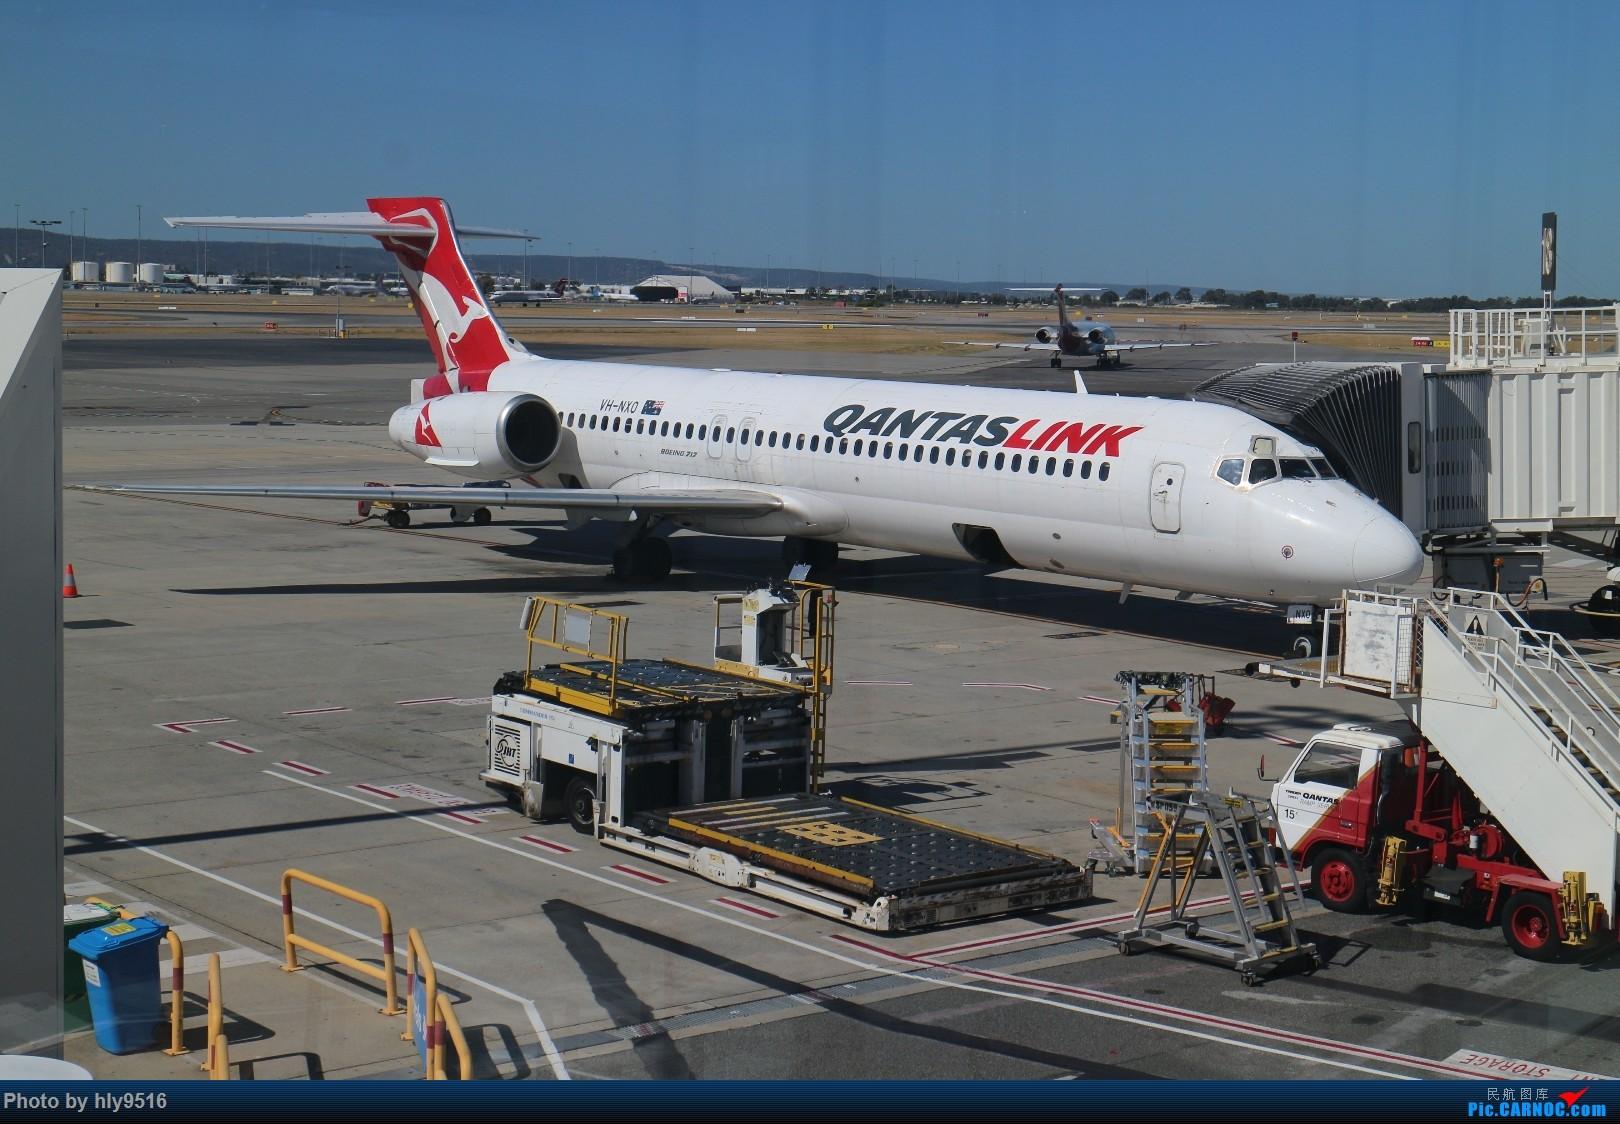 Re:[原创]【PER-MEL】第一次发游记,体验澳航最长航线QF10澳洲国内段 BOEING 717-200 VH-NXO PER